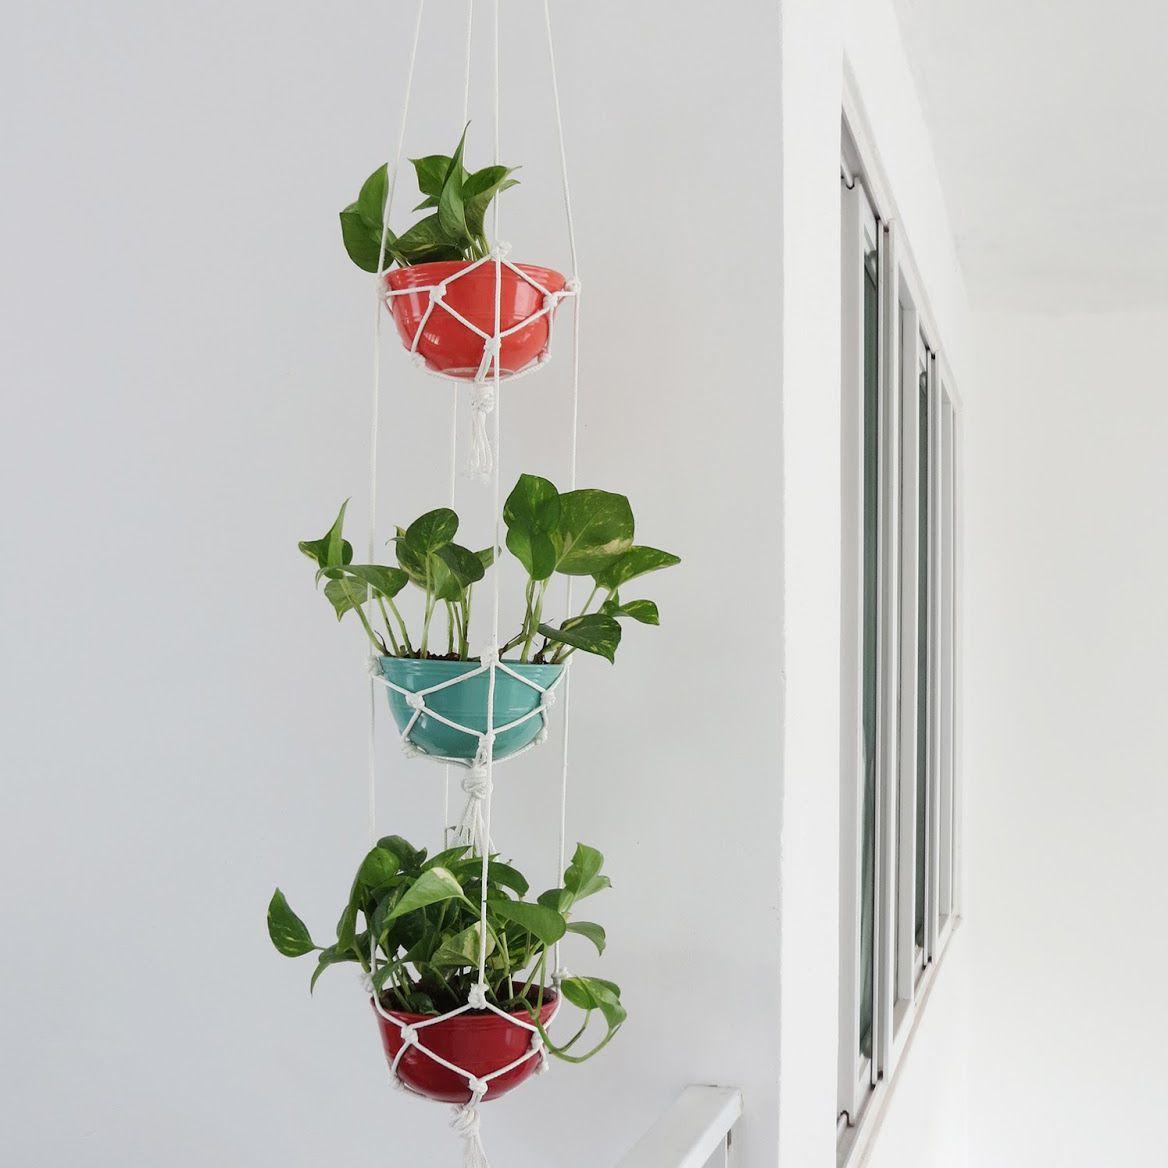 layered plant holder made of macrame